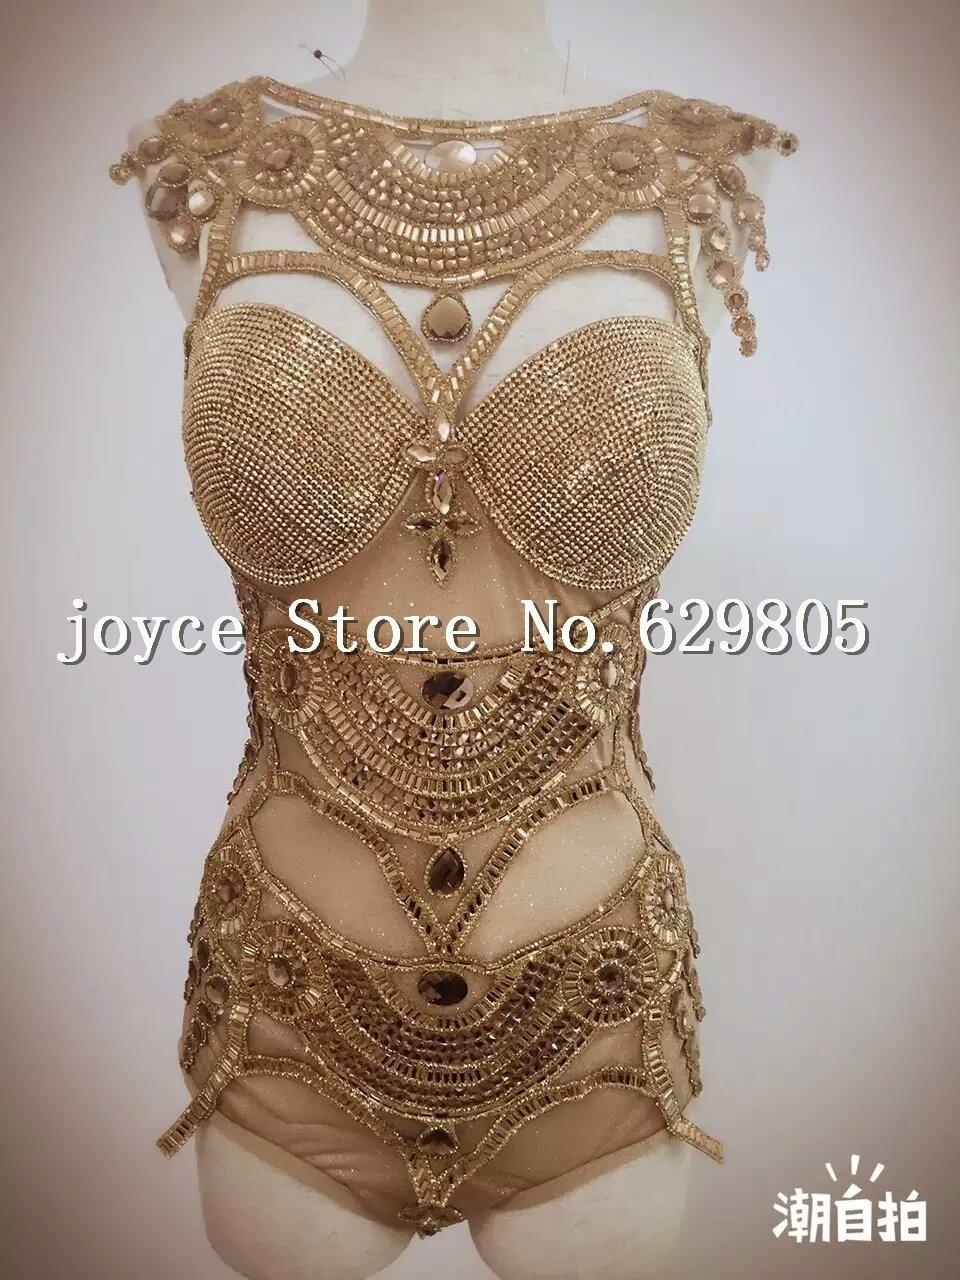 Women's Shining Leotard Bright Bodysuit Costume Crystal Perspective Stage Dancewear Performance Singer Nightclub Clothes